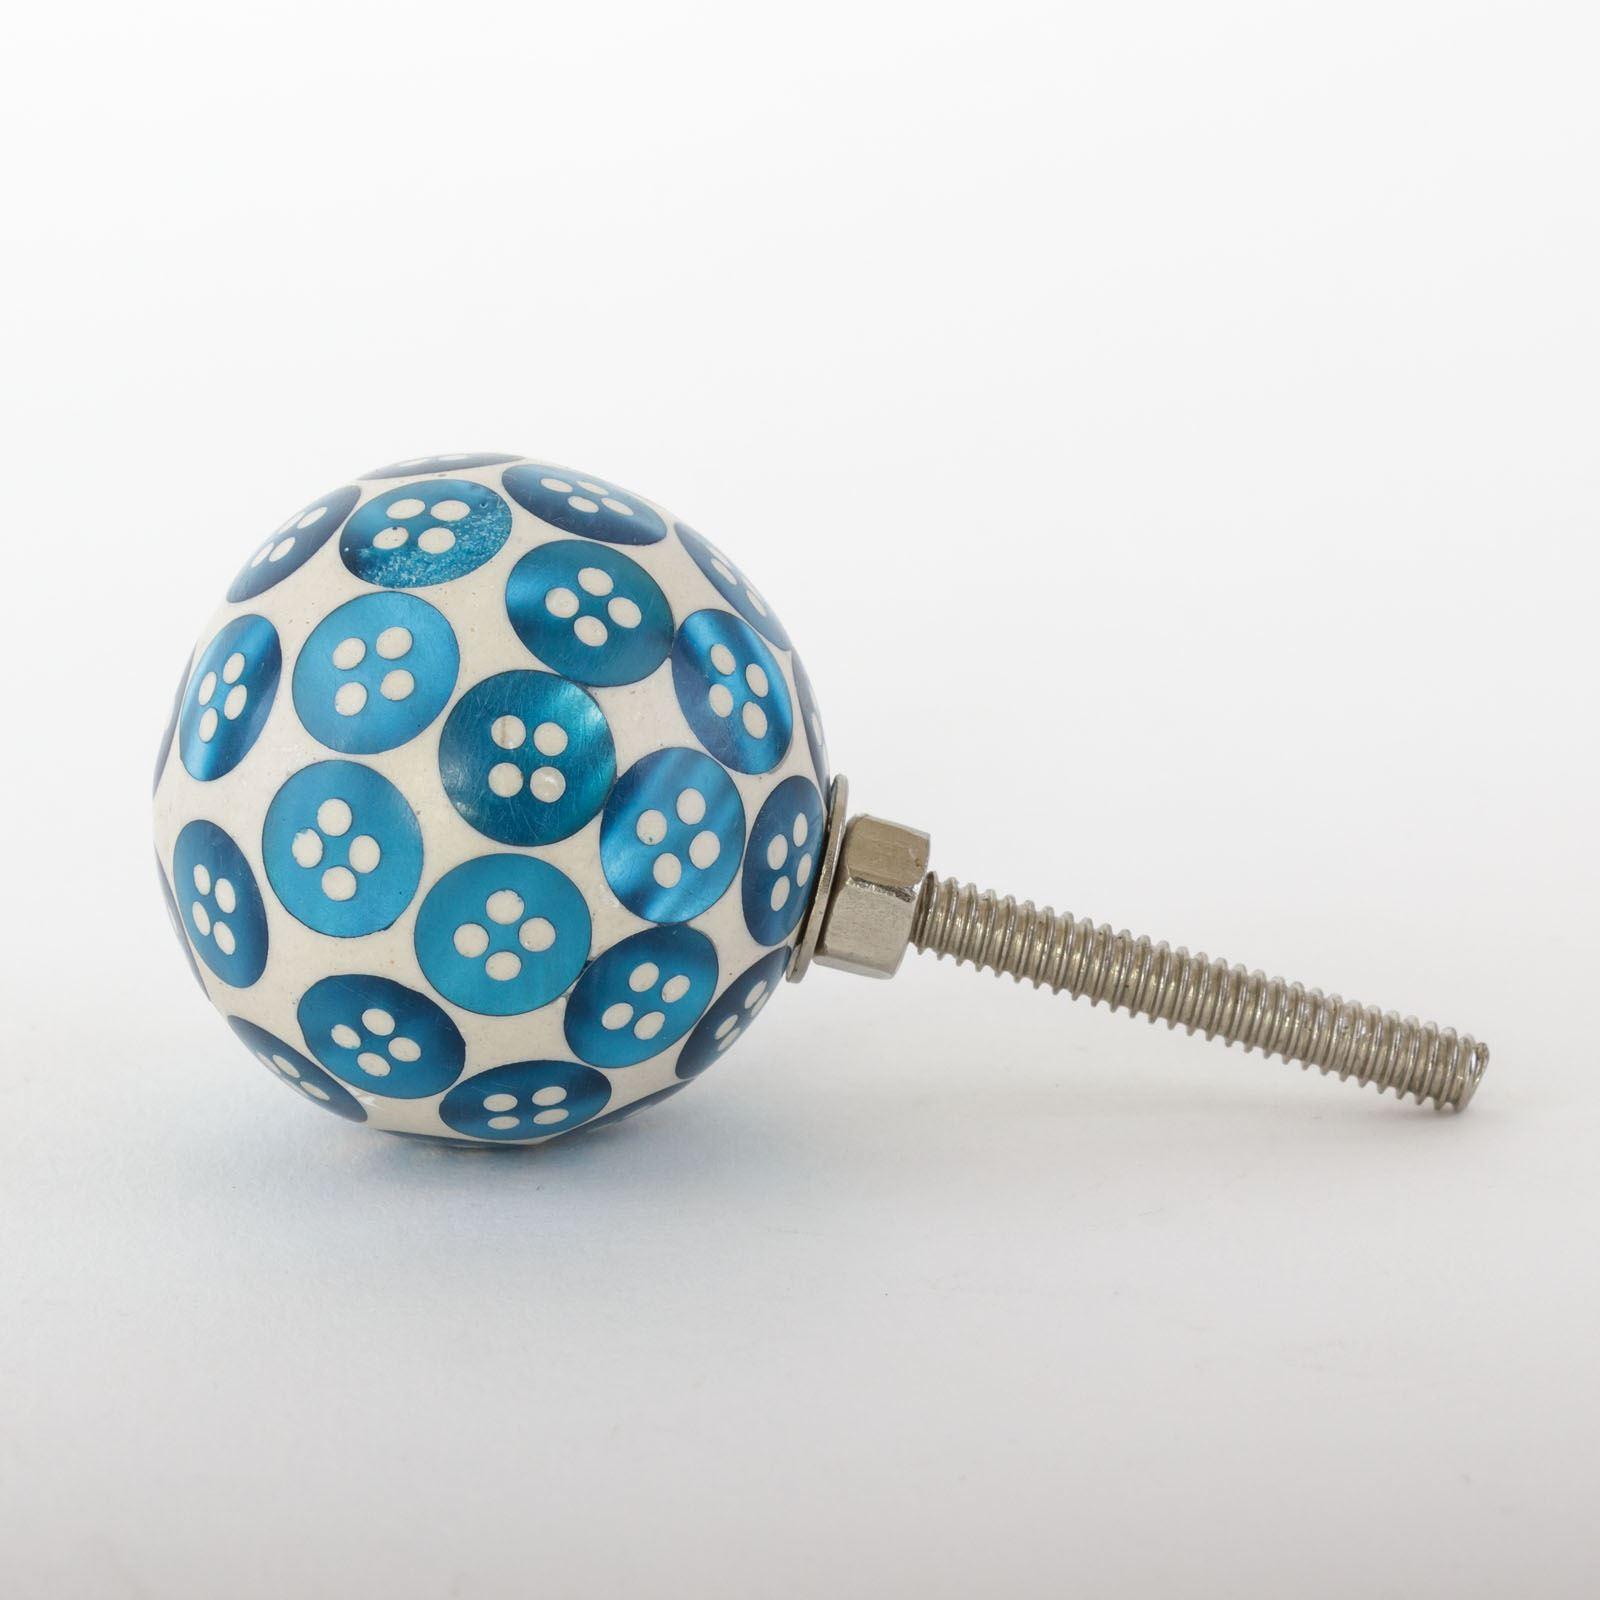 Dots-amp-Stripes-Ceramic-Door-Knobs-Handles-Furniture-Drawer-Pulls-Cupboard miniatura 37